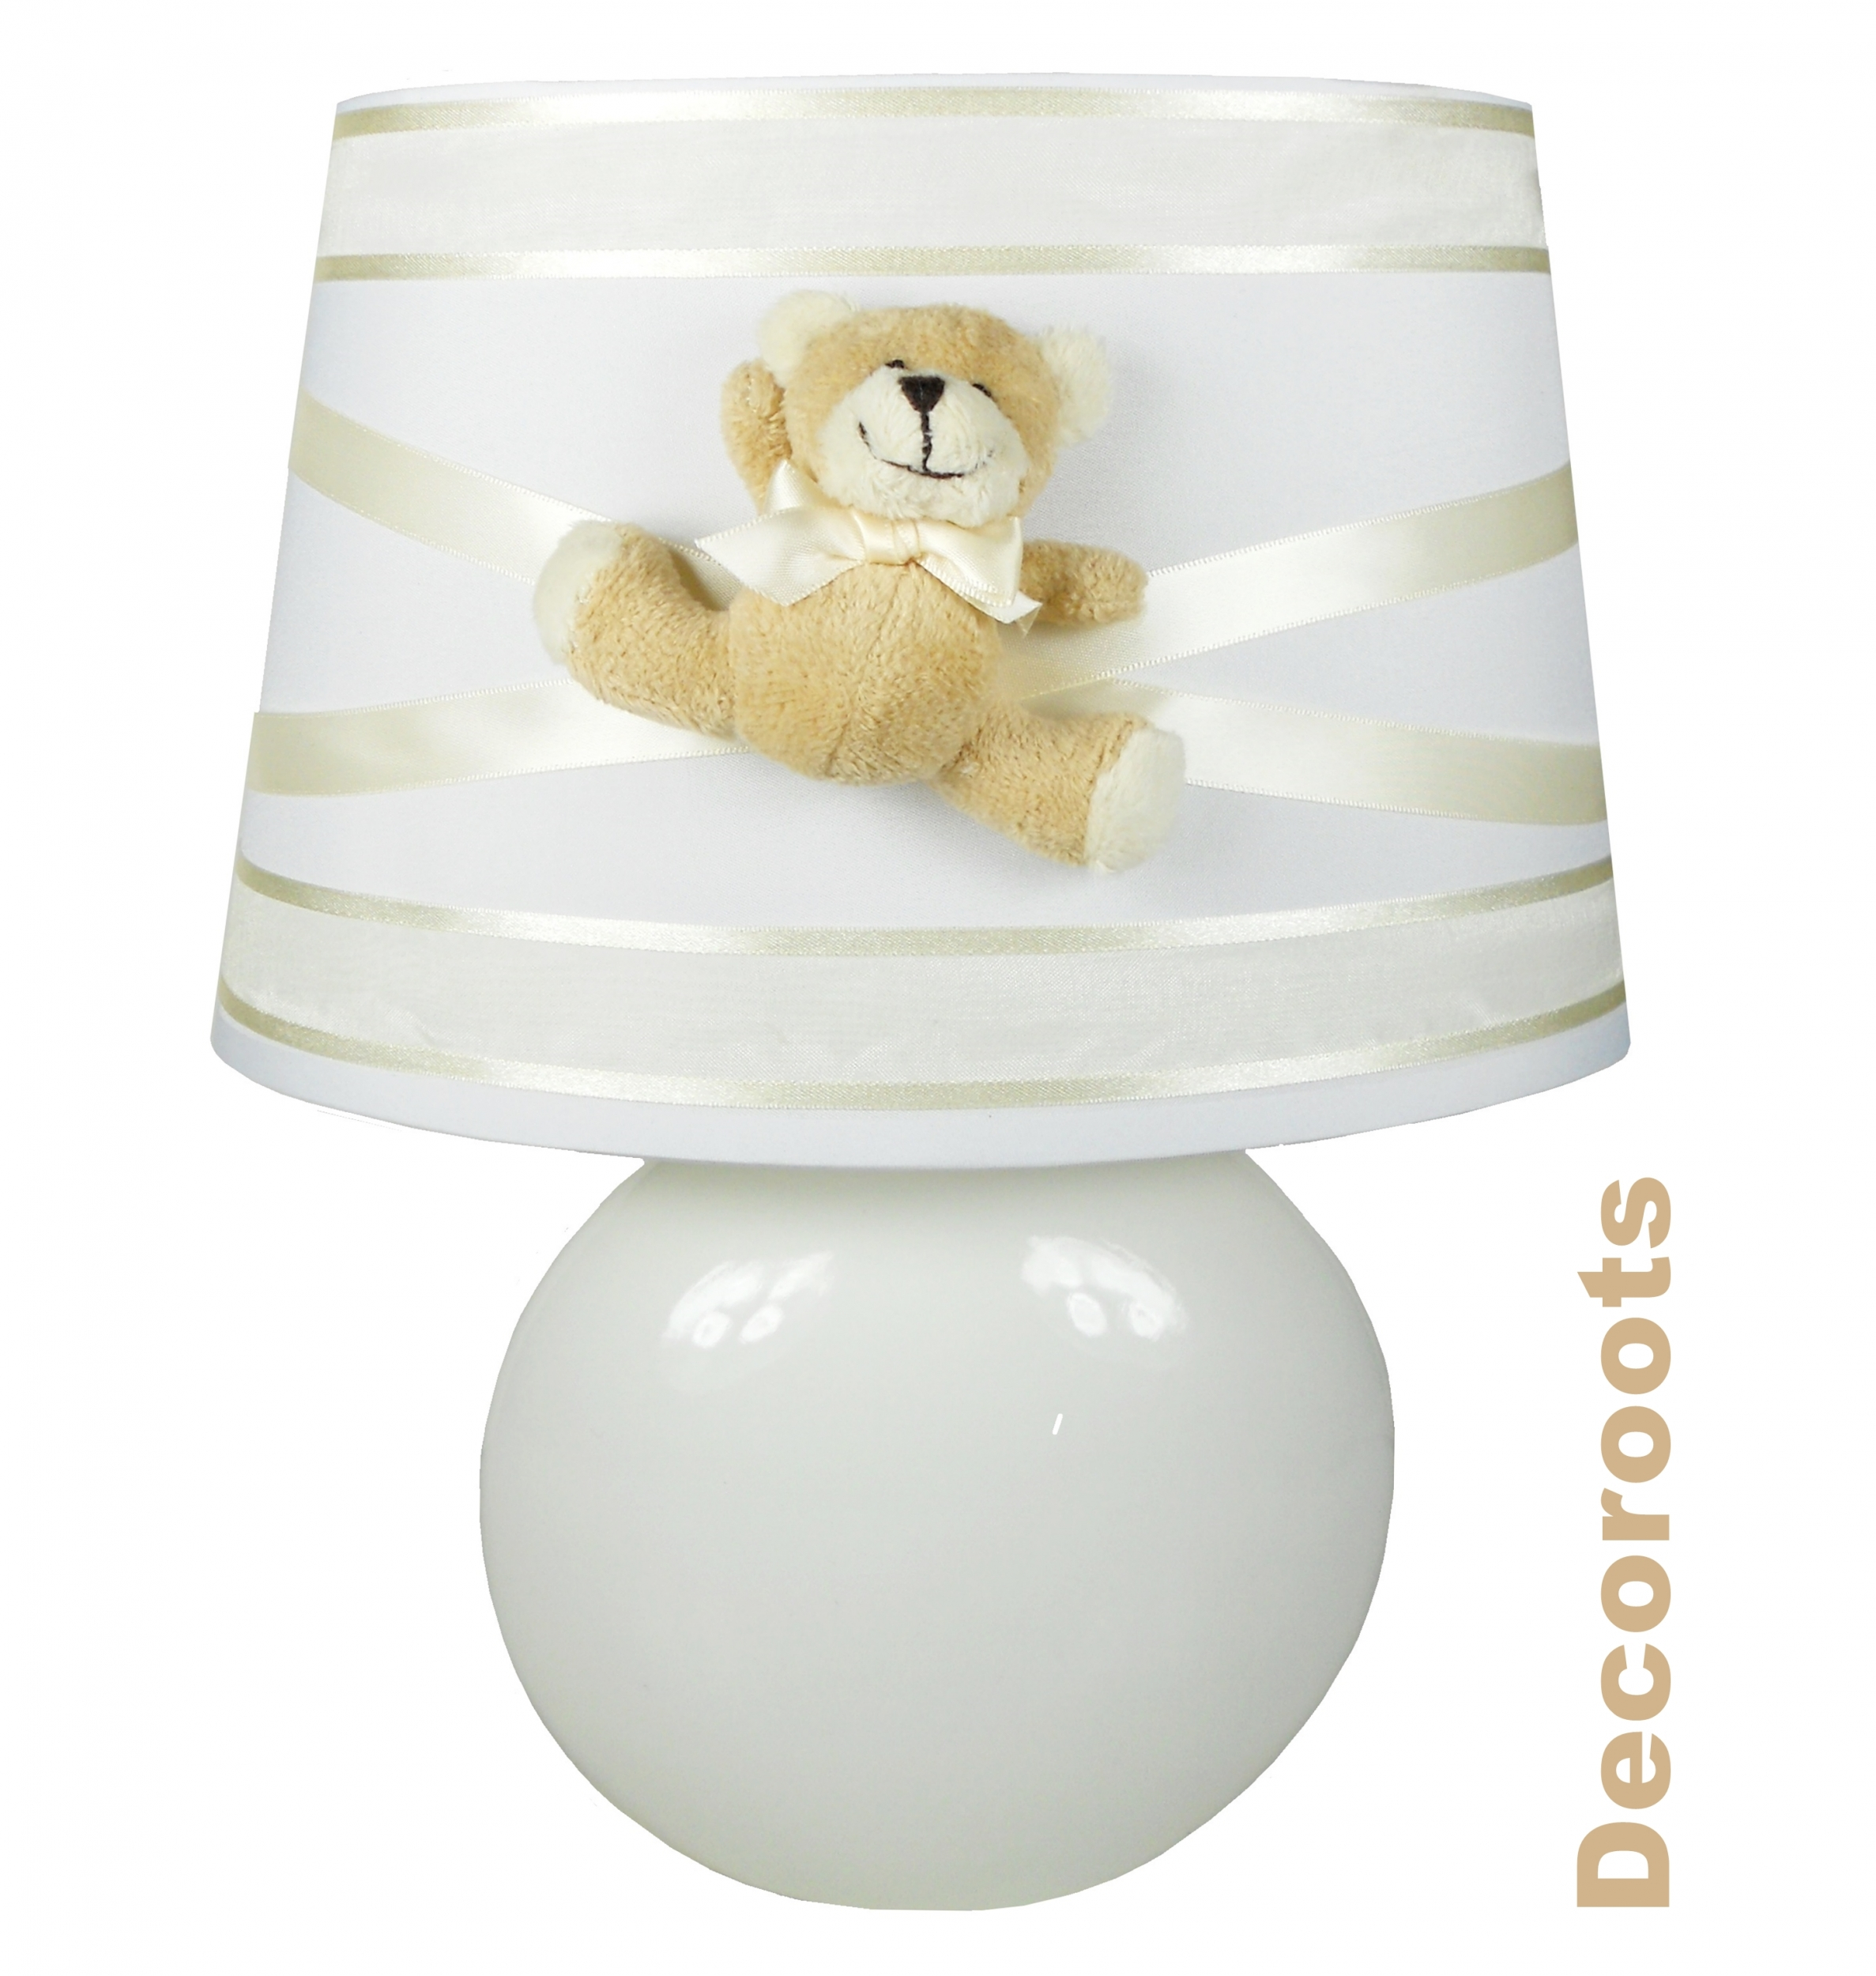 lampe b b ours peluche d coration chambre enfant b b. Black Bedroom Furniture Sets. Home Design Ideas